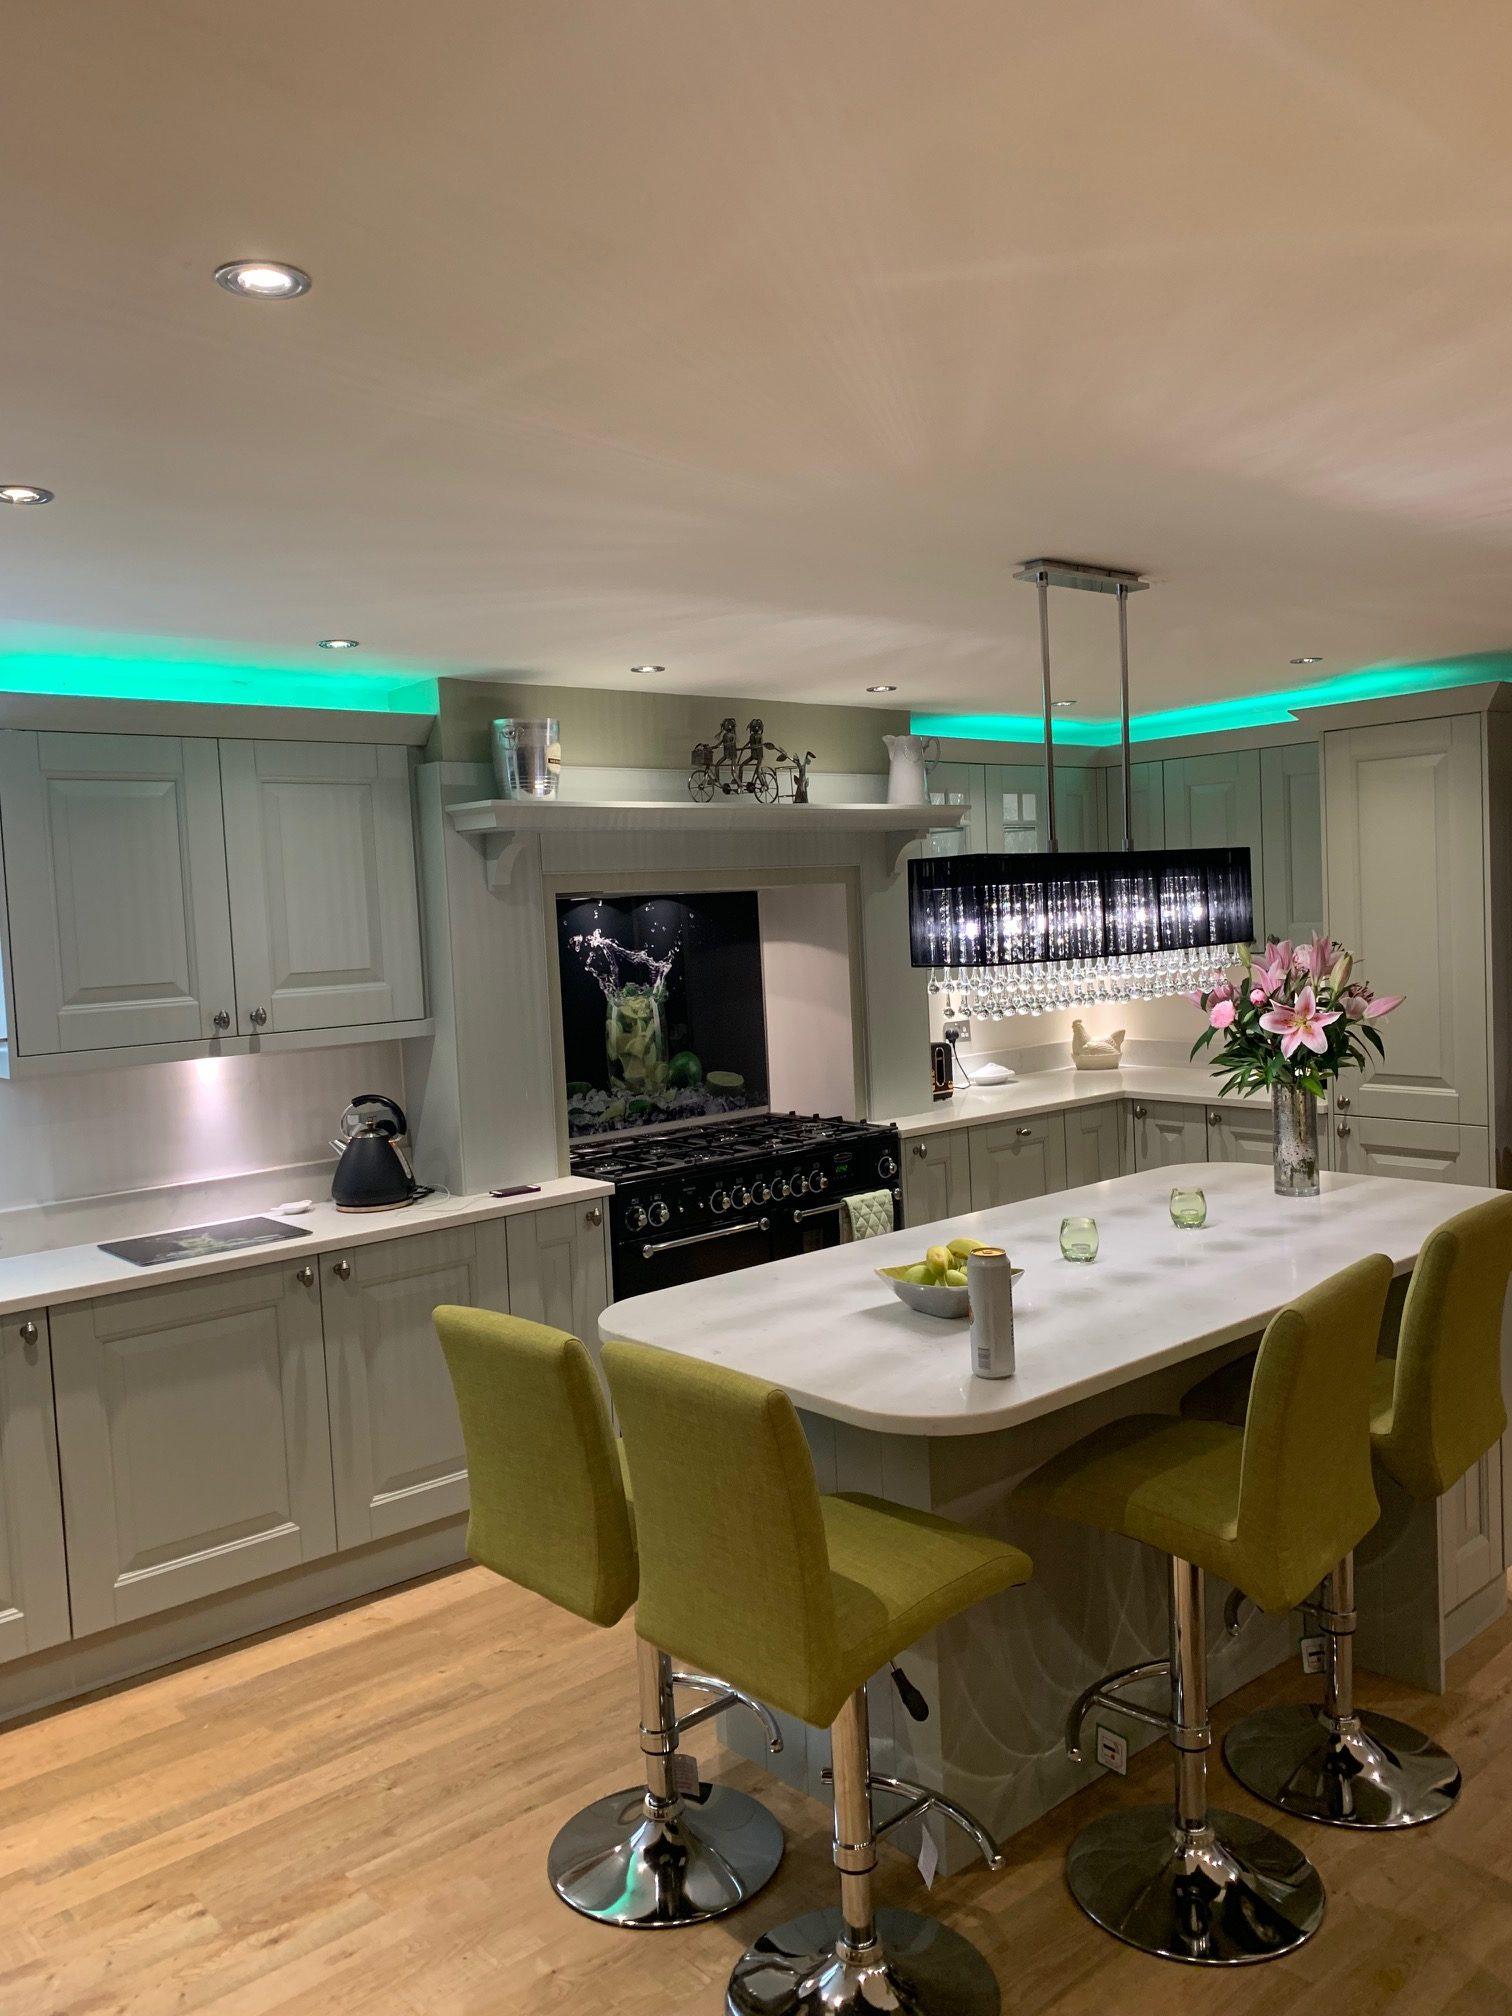 poynton_cheshire_house_refurbishment_4-e1563027127690